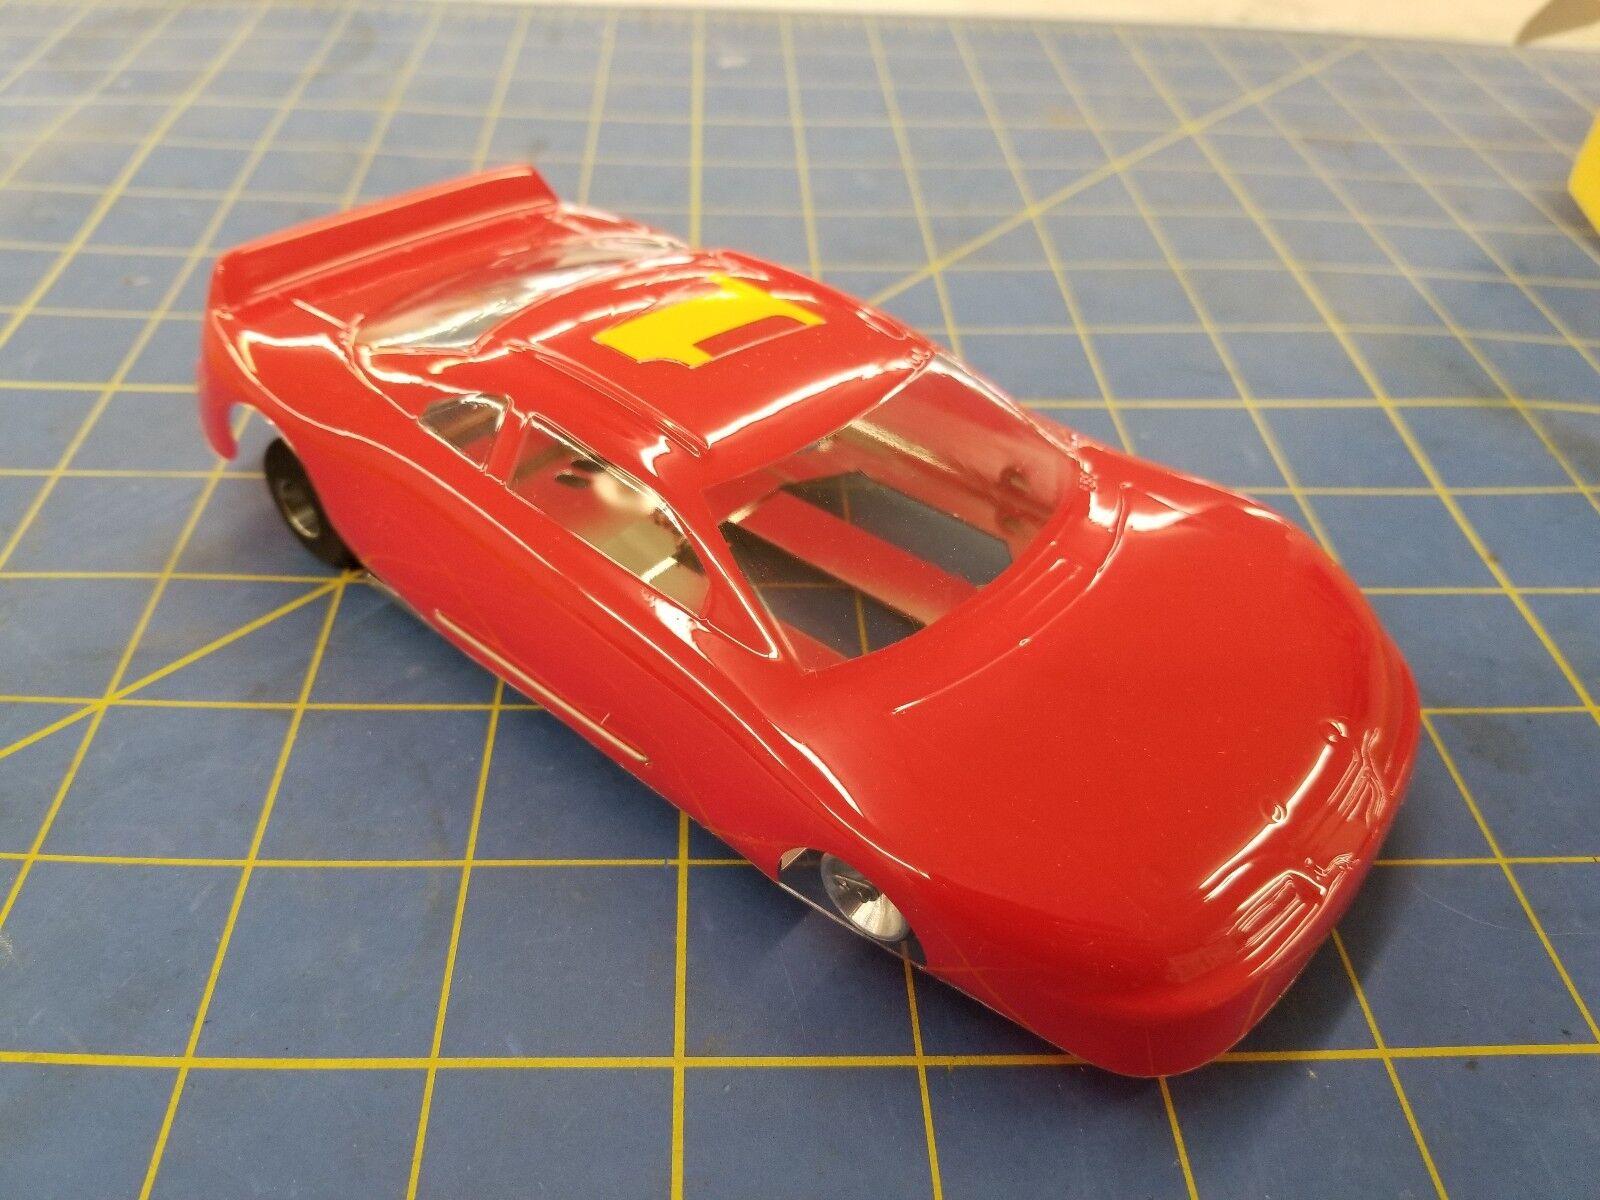 Champion Turbo Flex 4  Stock Coche Rojo  1 1 24 desde mediados de América